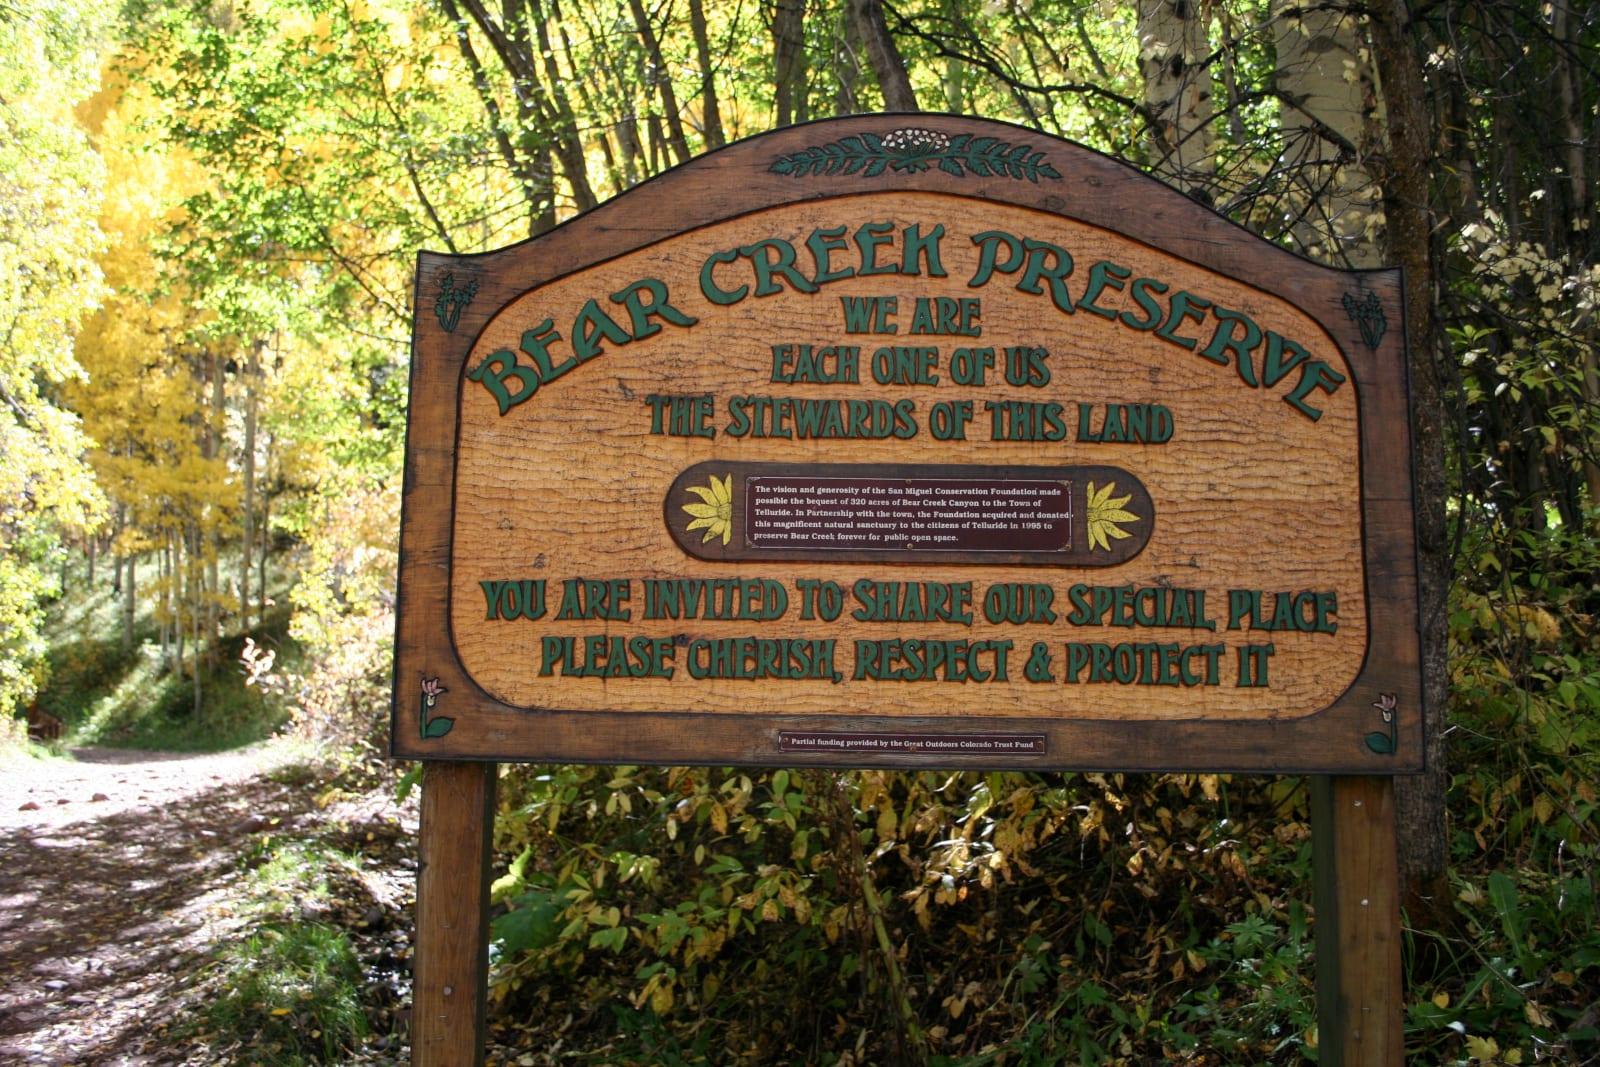 Bear Creek Preserve Telluride Colorado